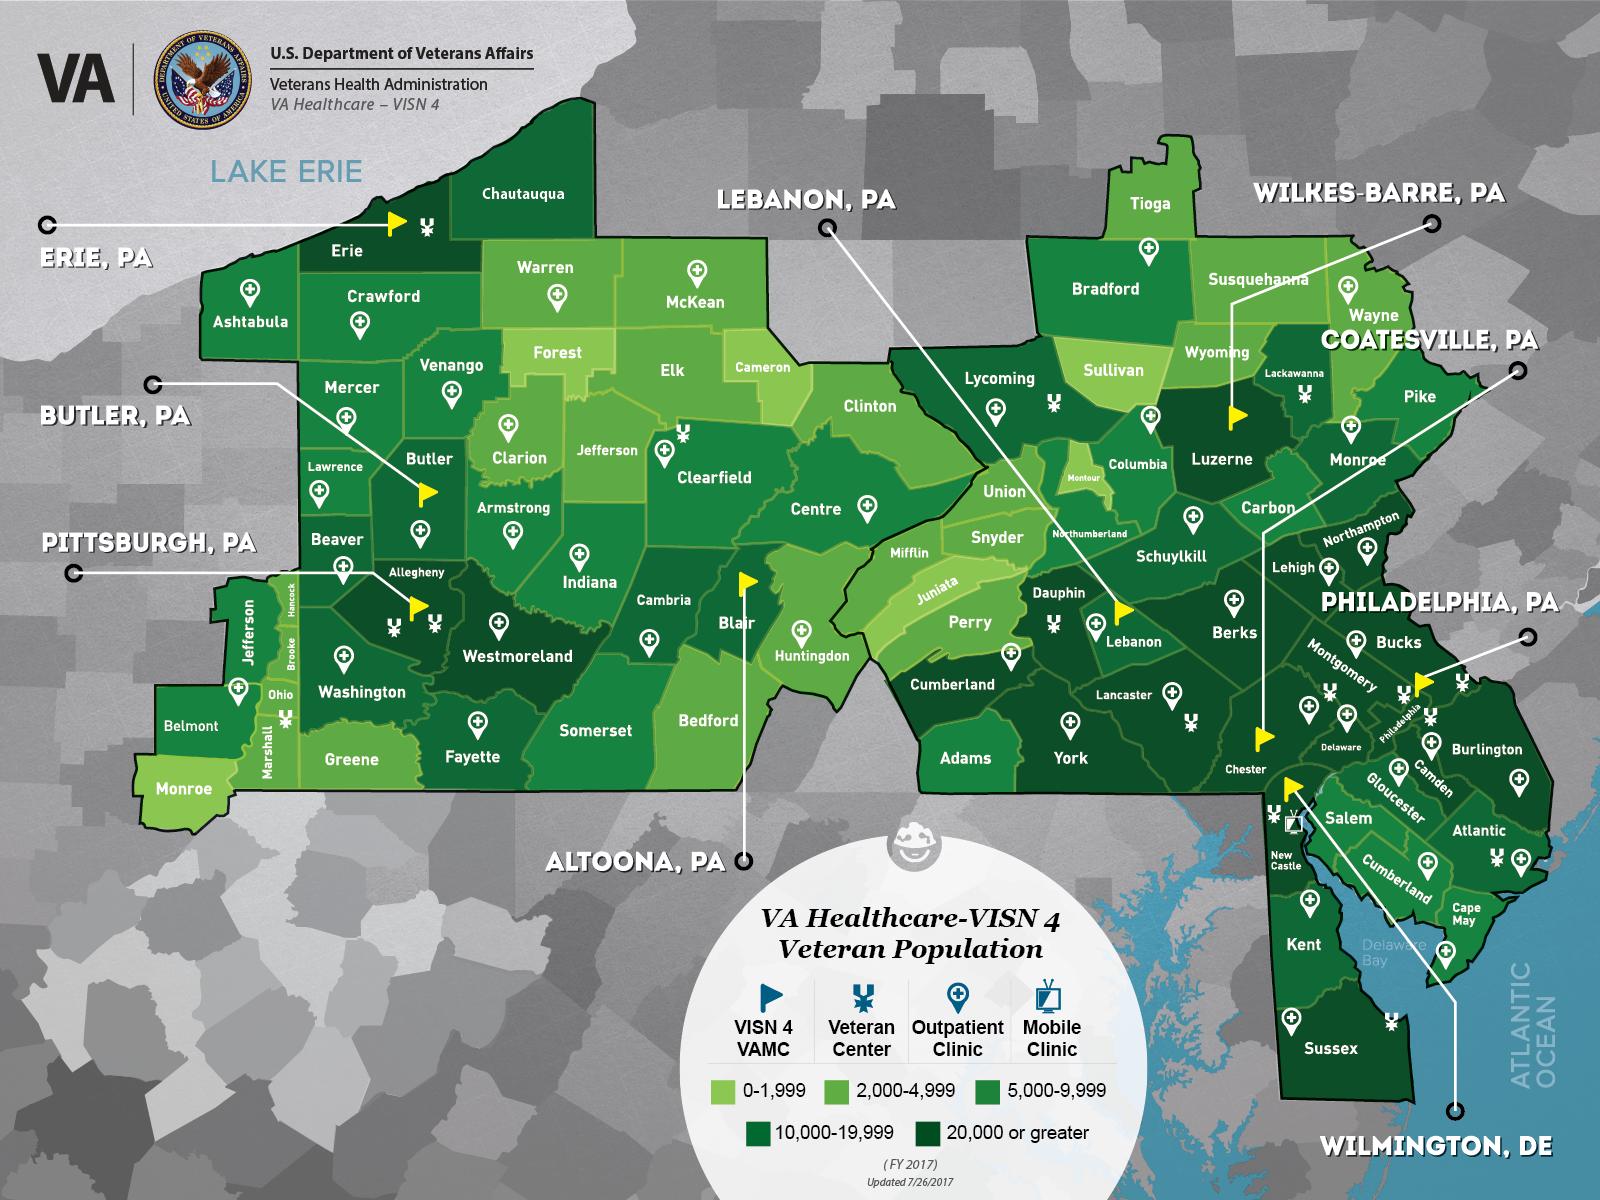 VA Healthcare-VISN 4 - Veteran Population and Service Area Map